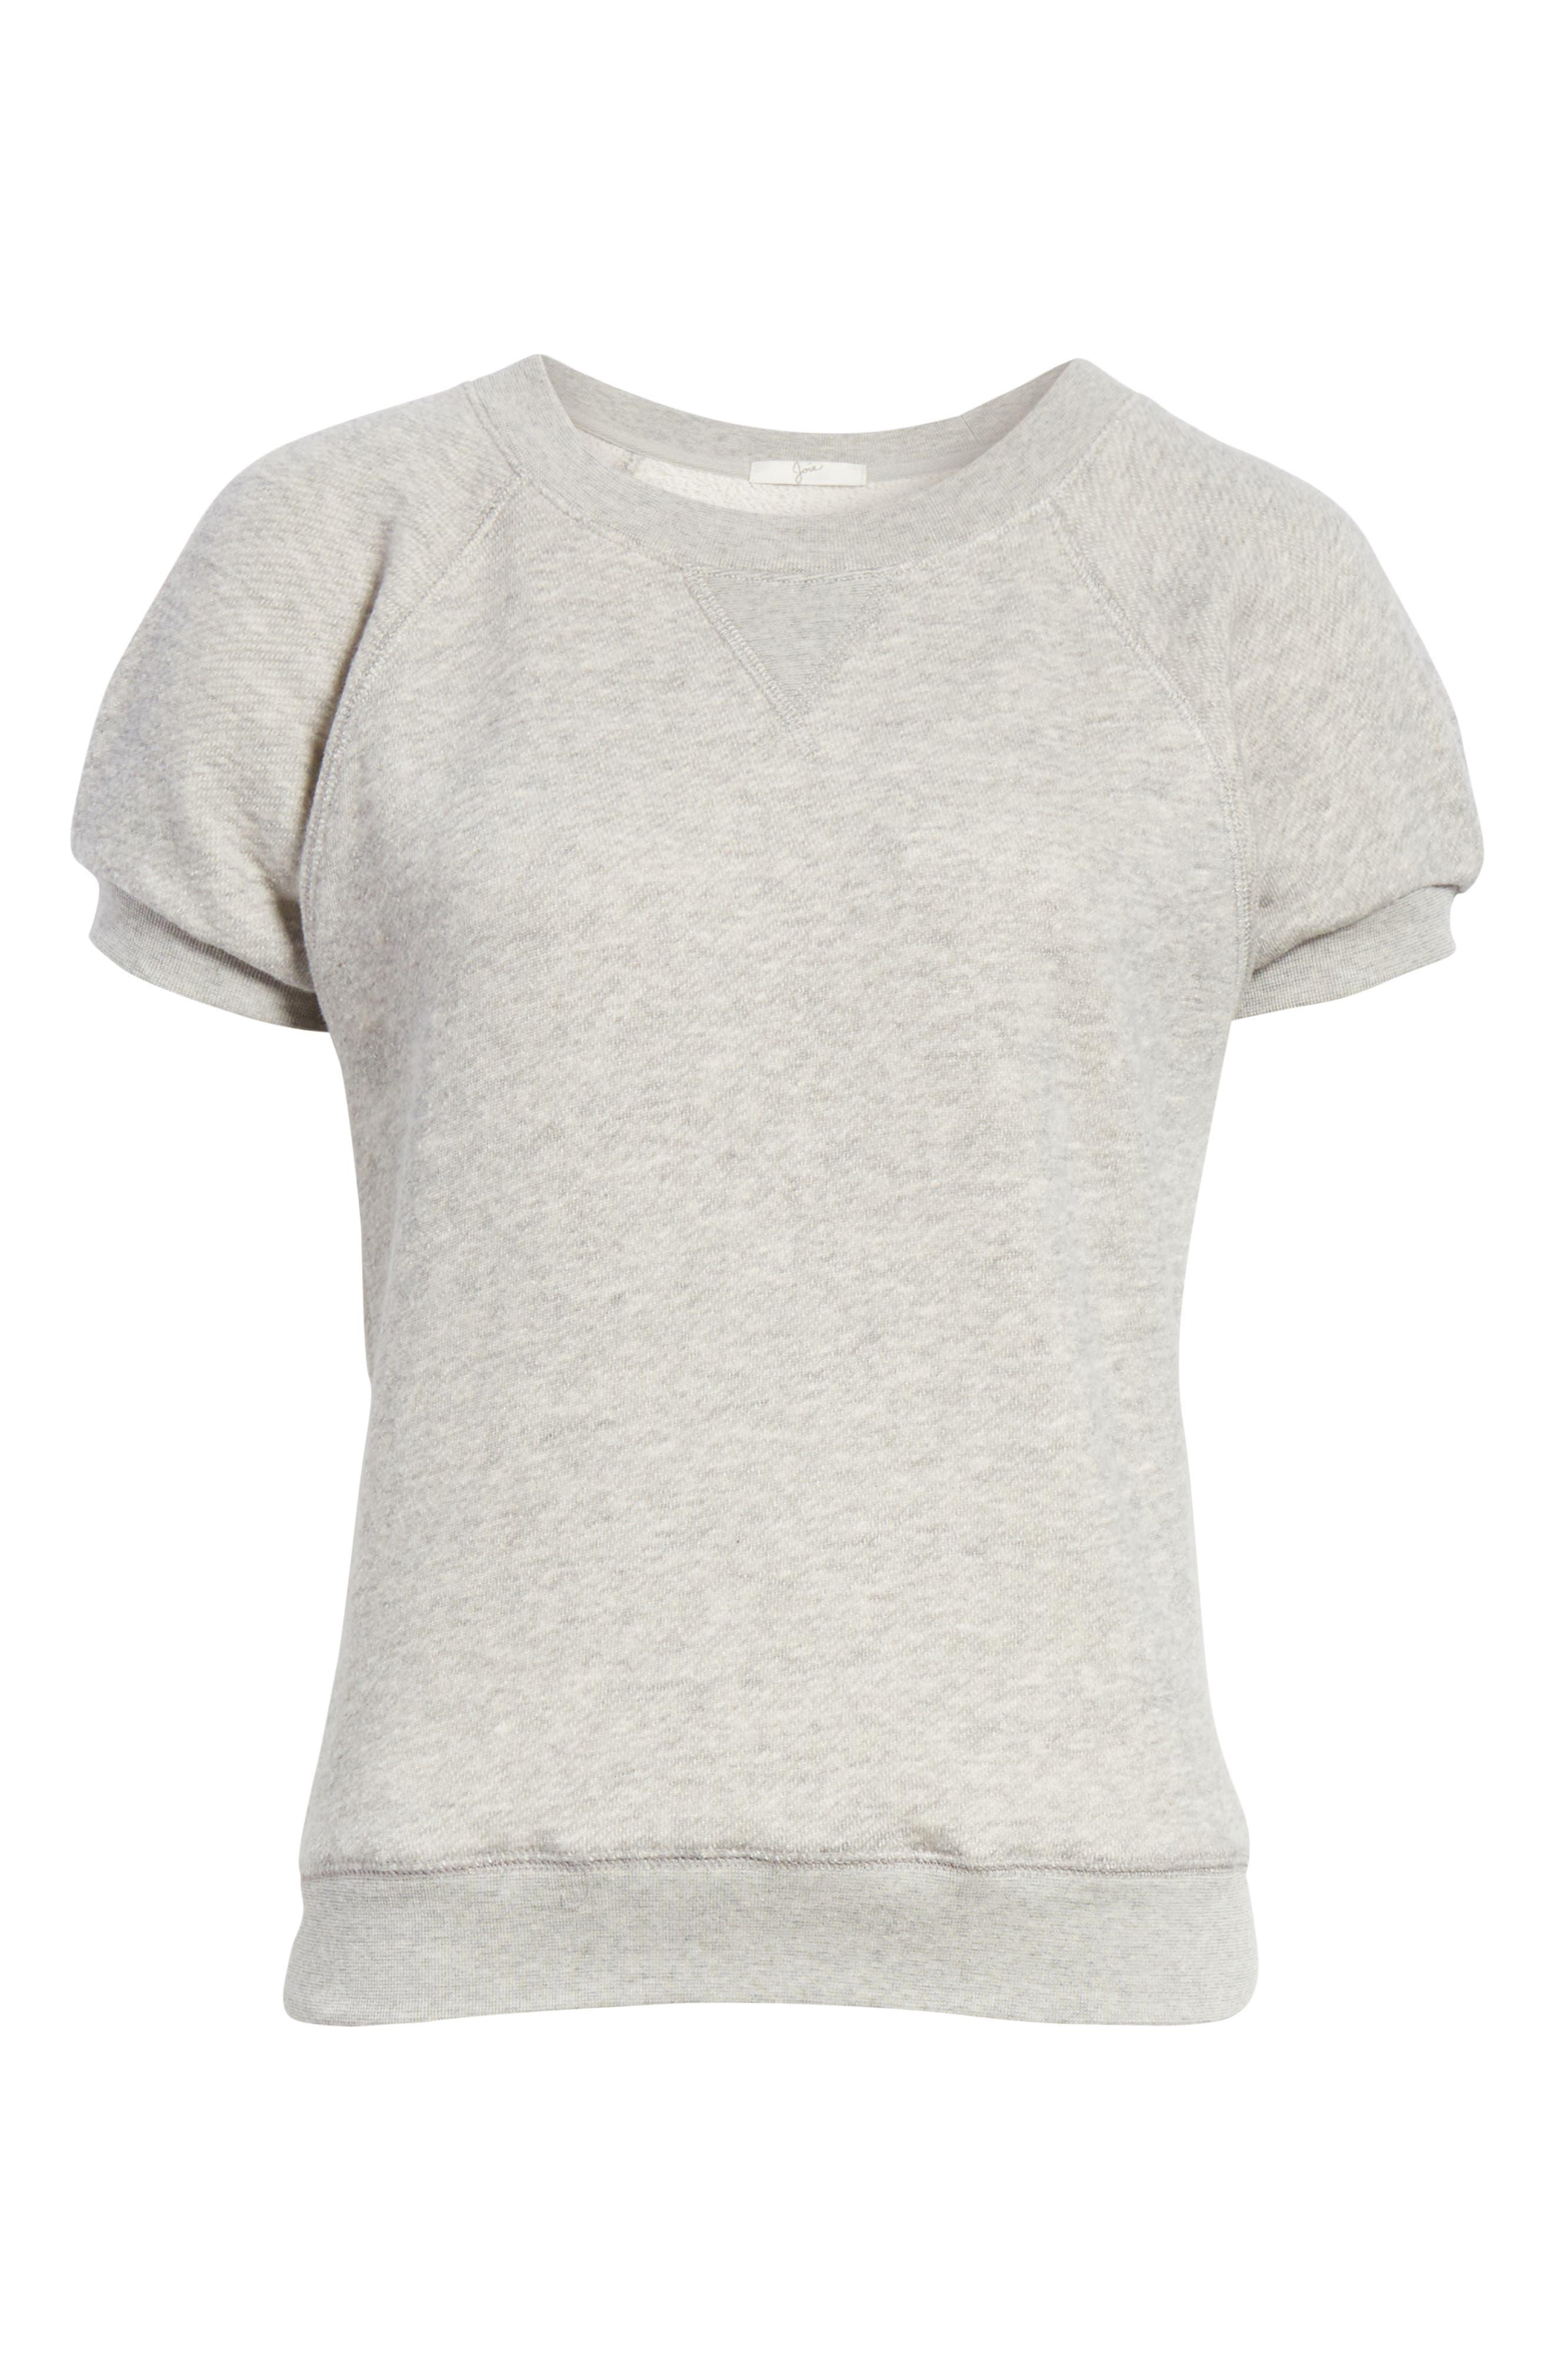 Christal Puff Sleeve Sweatshirt,                             Alternate thumbnail 6, color,                             Heather Grey